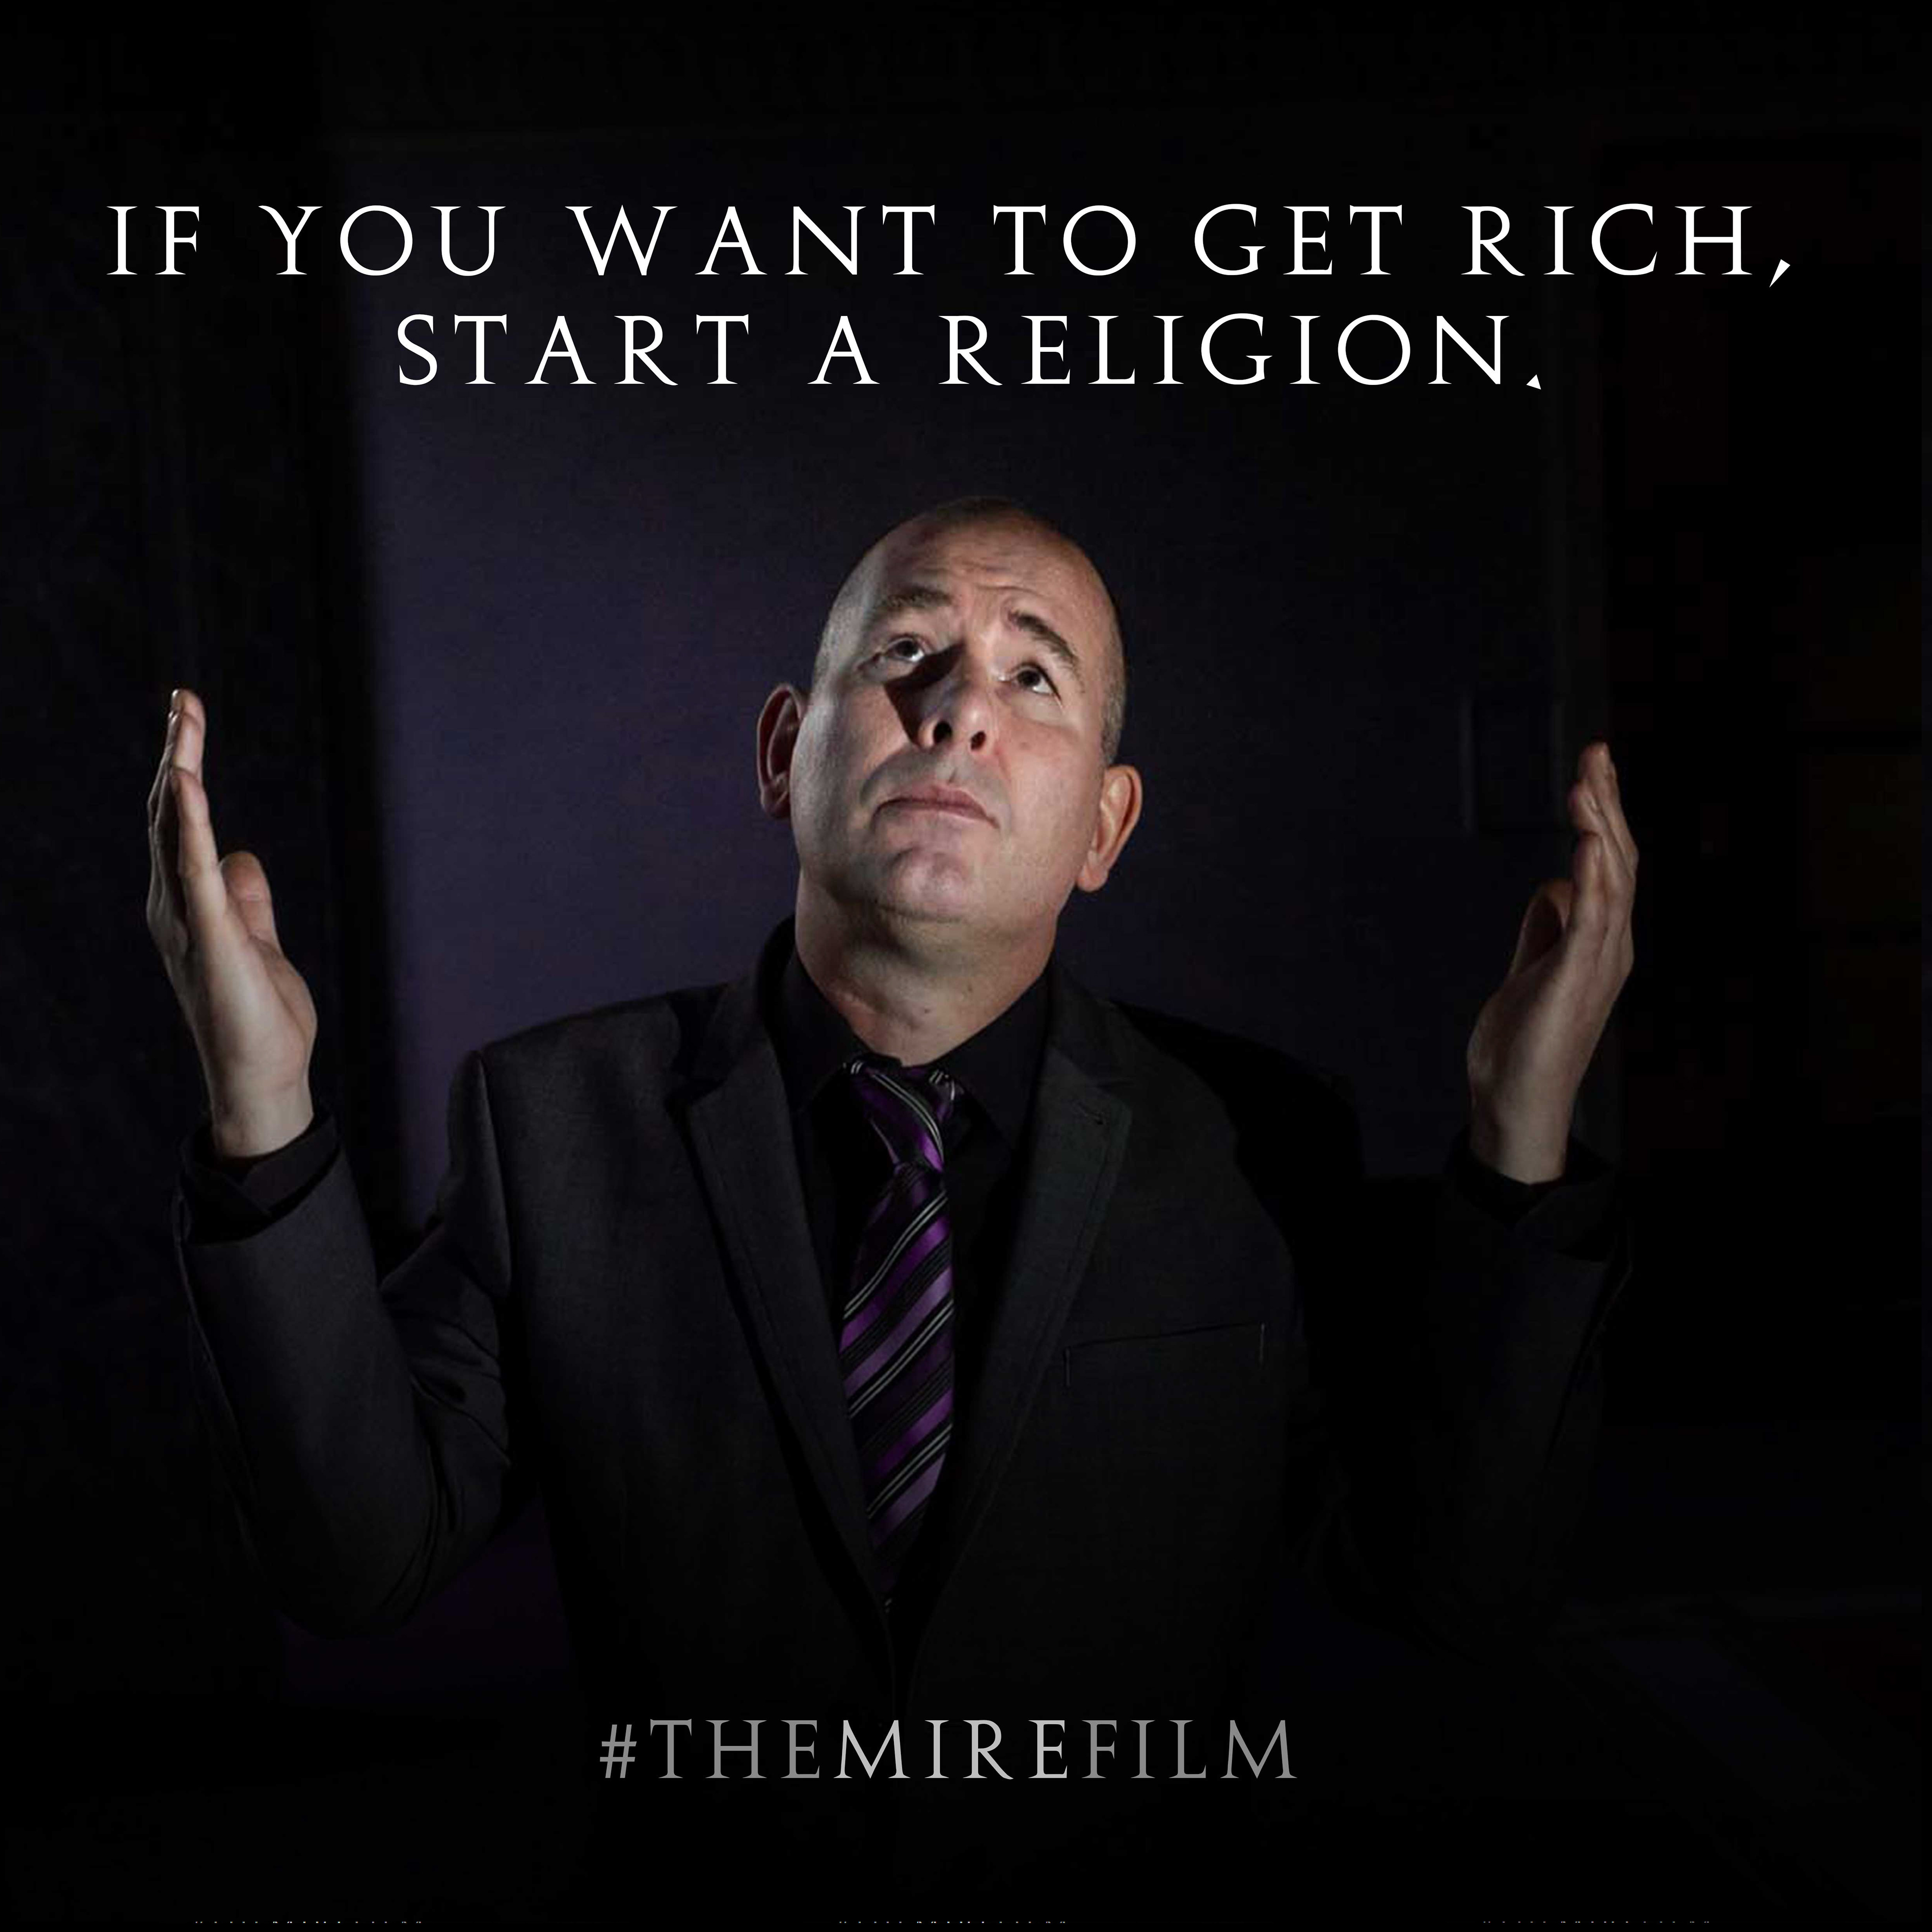 Start a religion